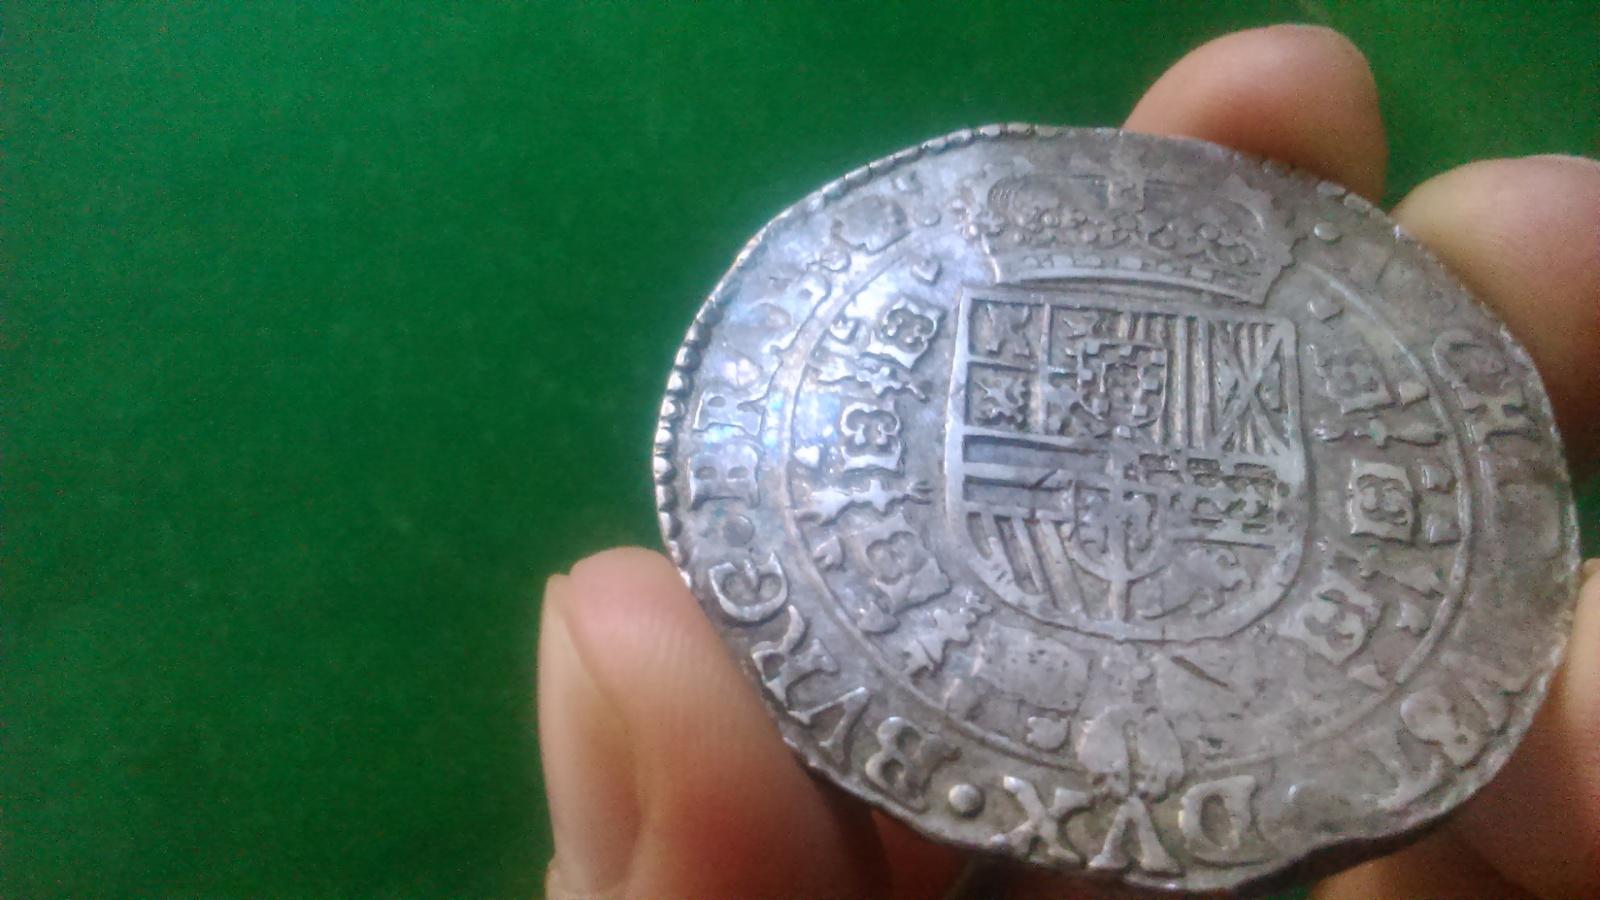 1 Patagón. Felipe IV 1654 Amberes. Dedicada a Lanzarote 2nv4c2p